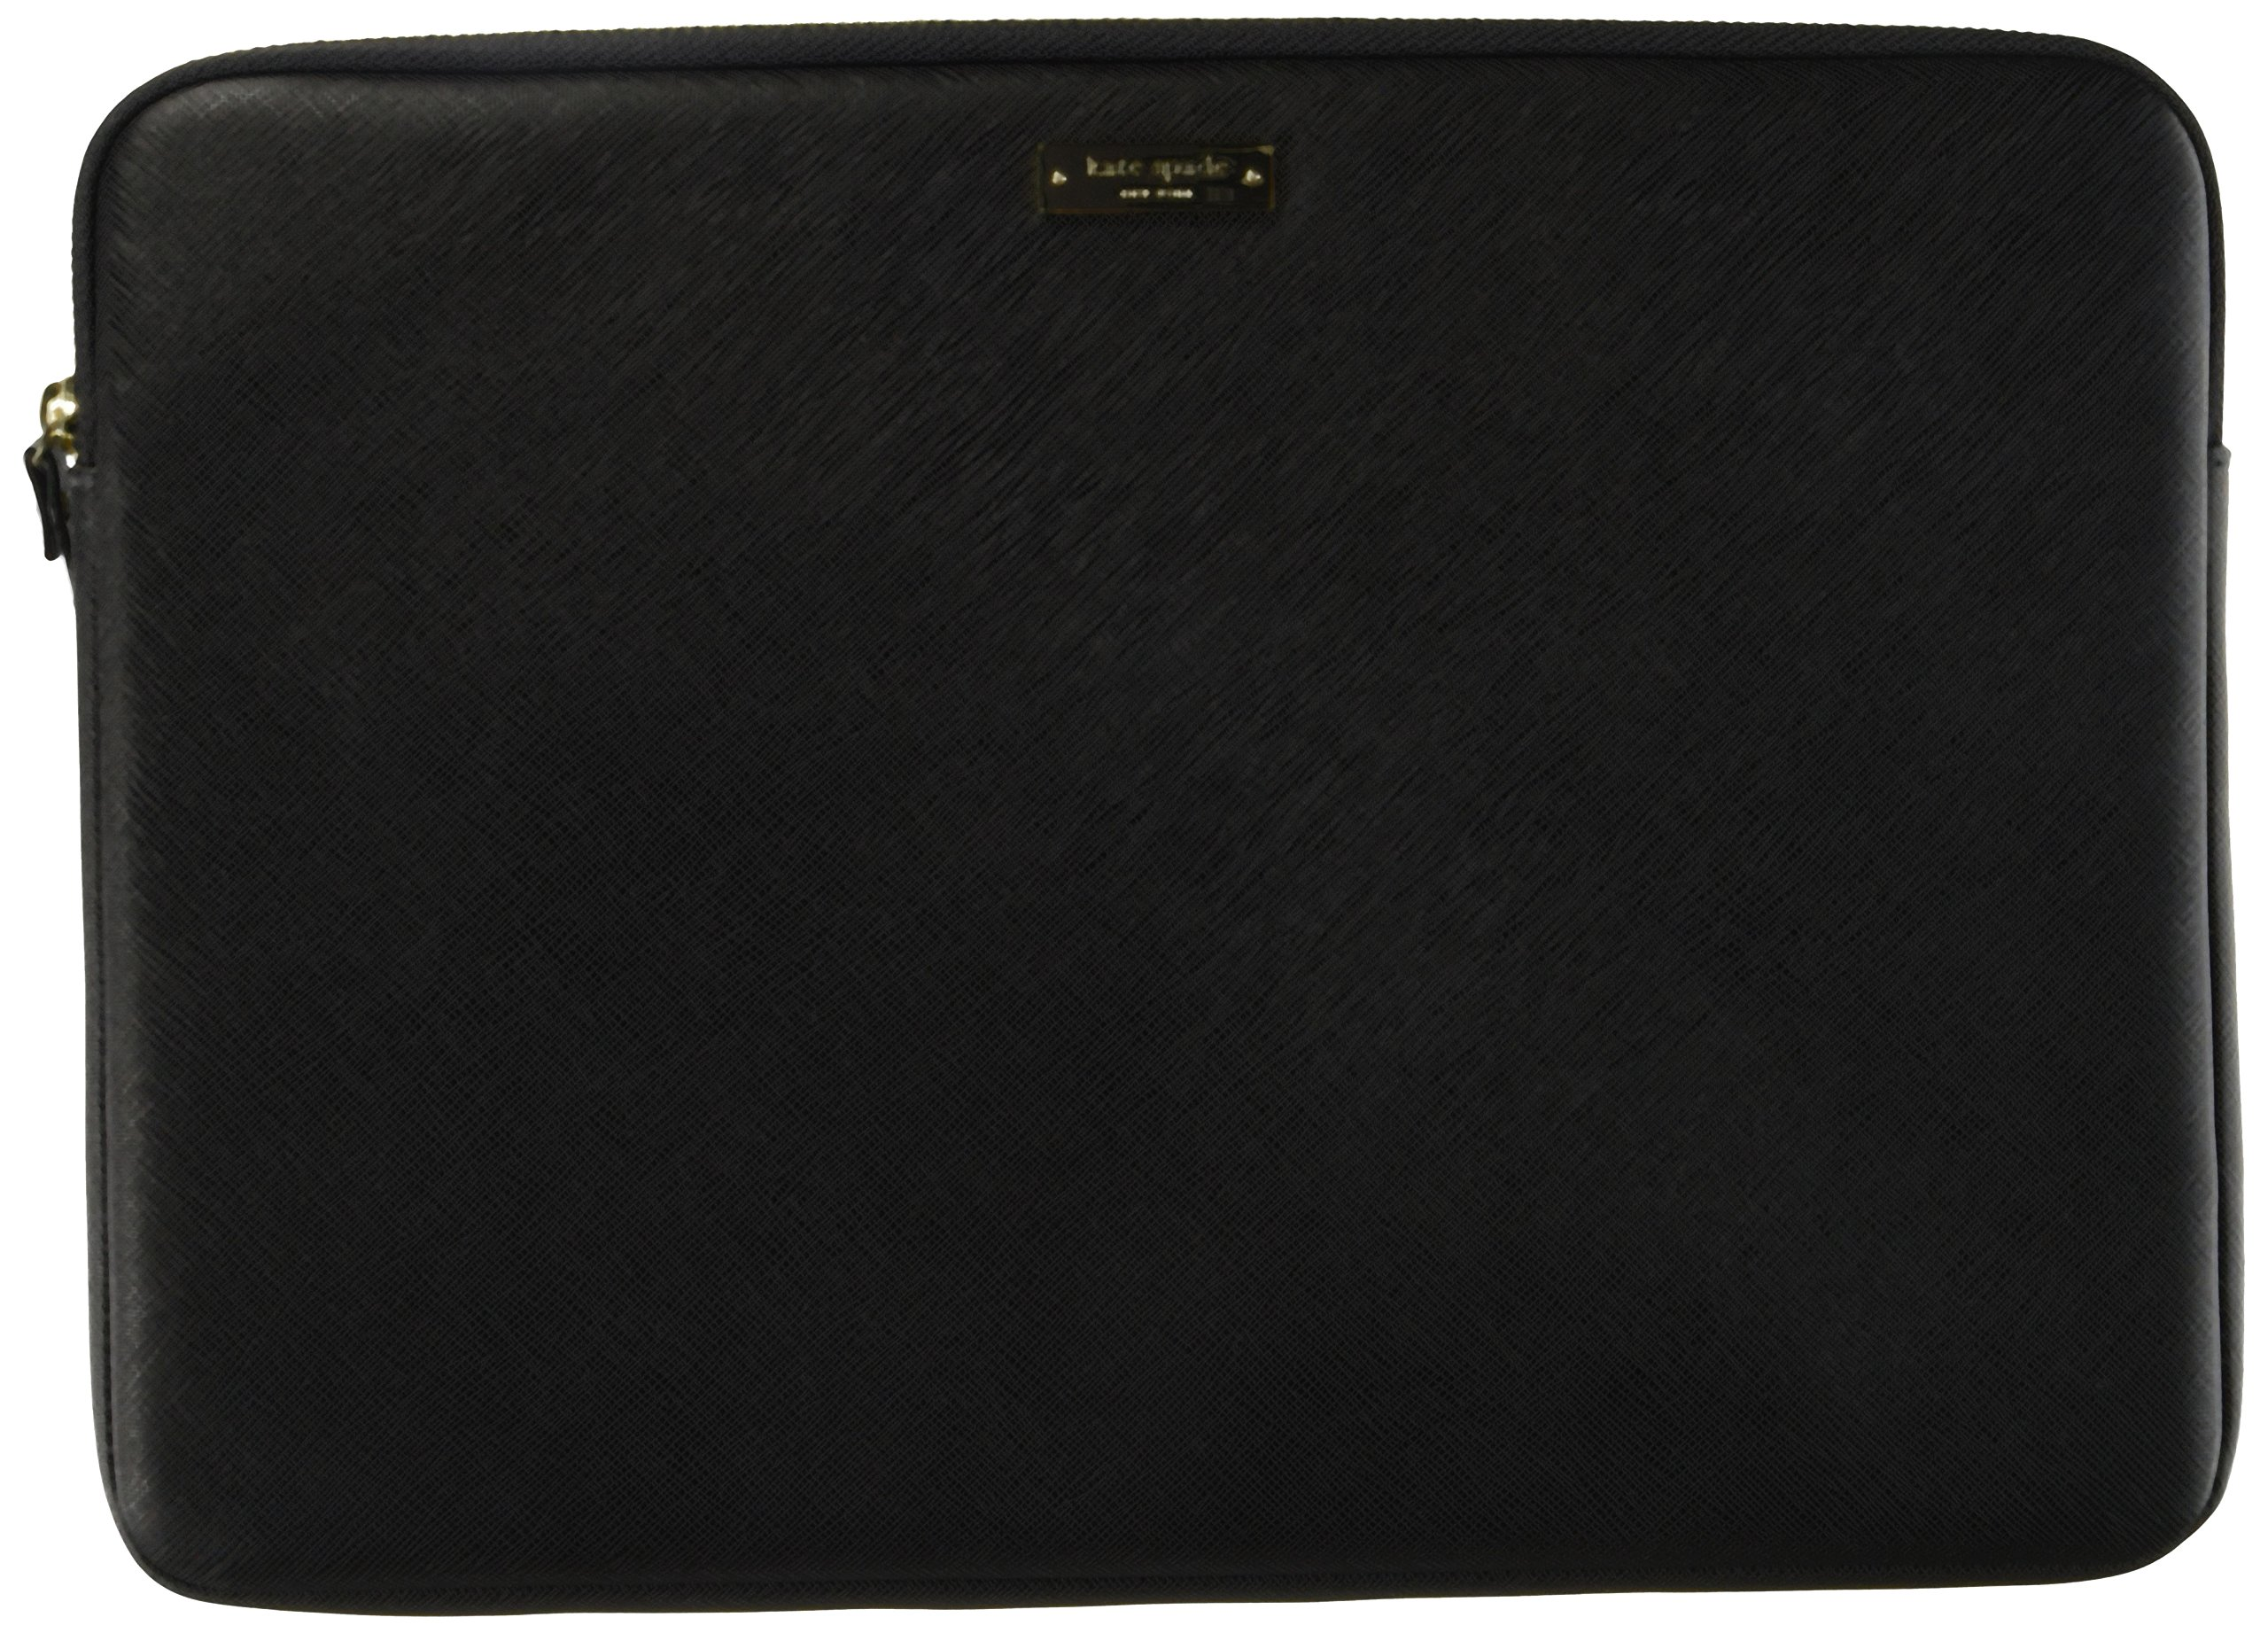 kate spade new york Saffiano Laptop Sleeve for 13'' MacBook - Black